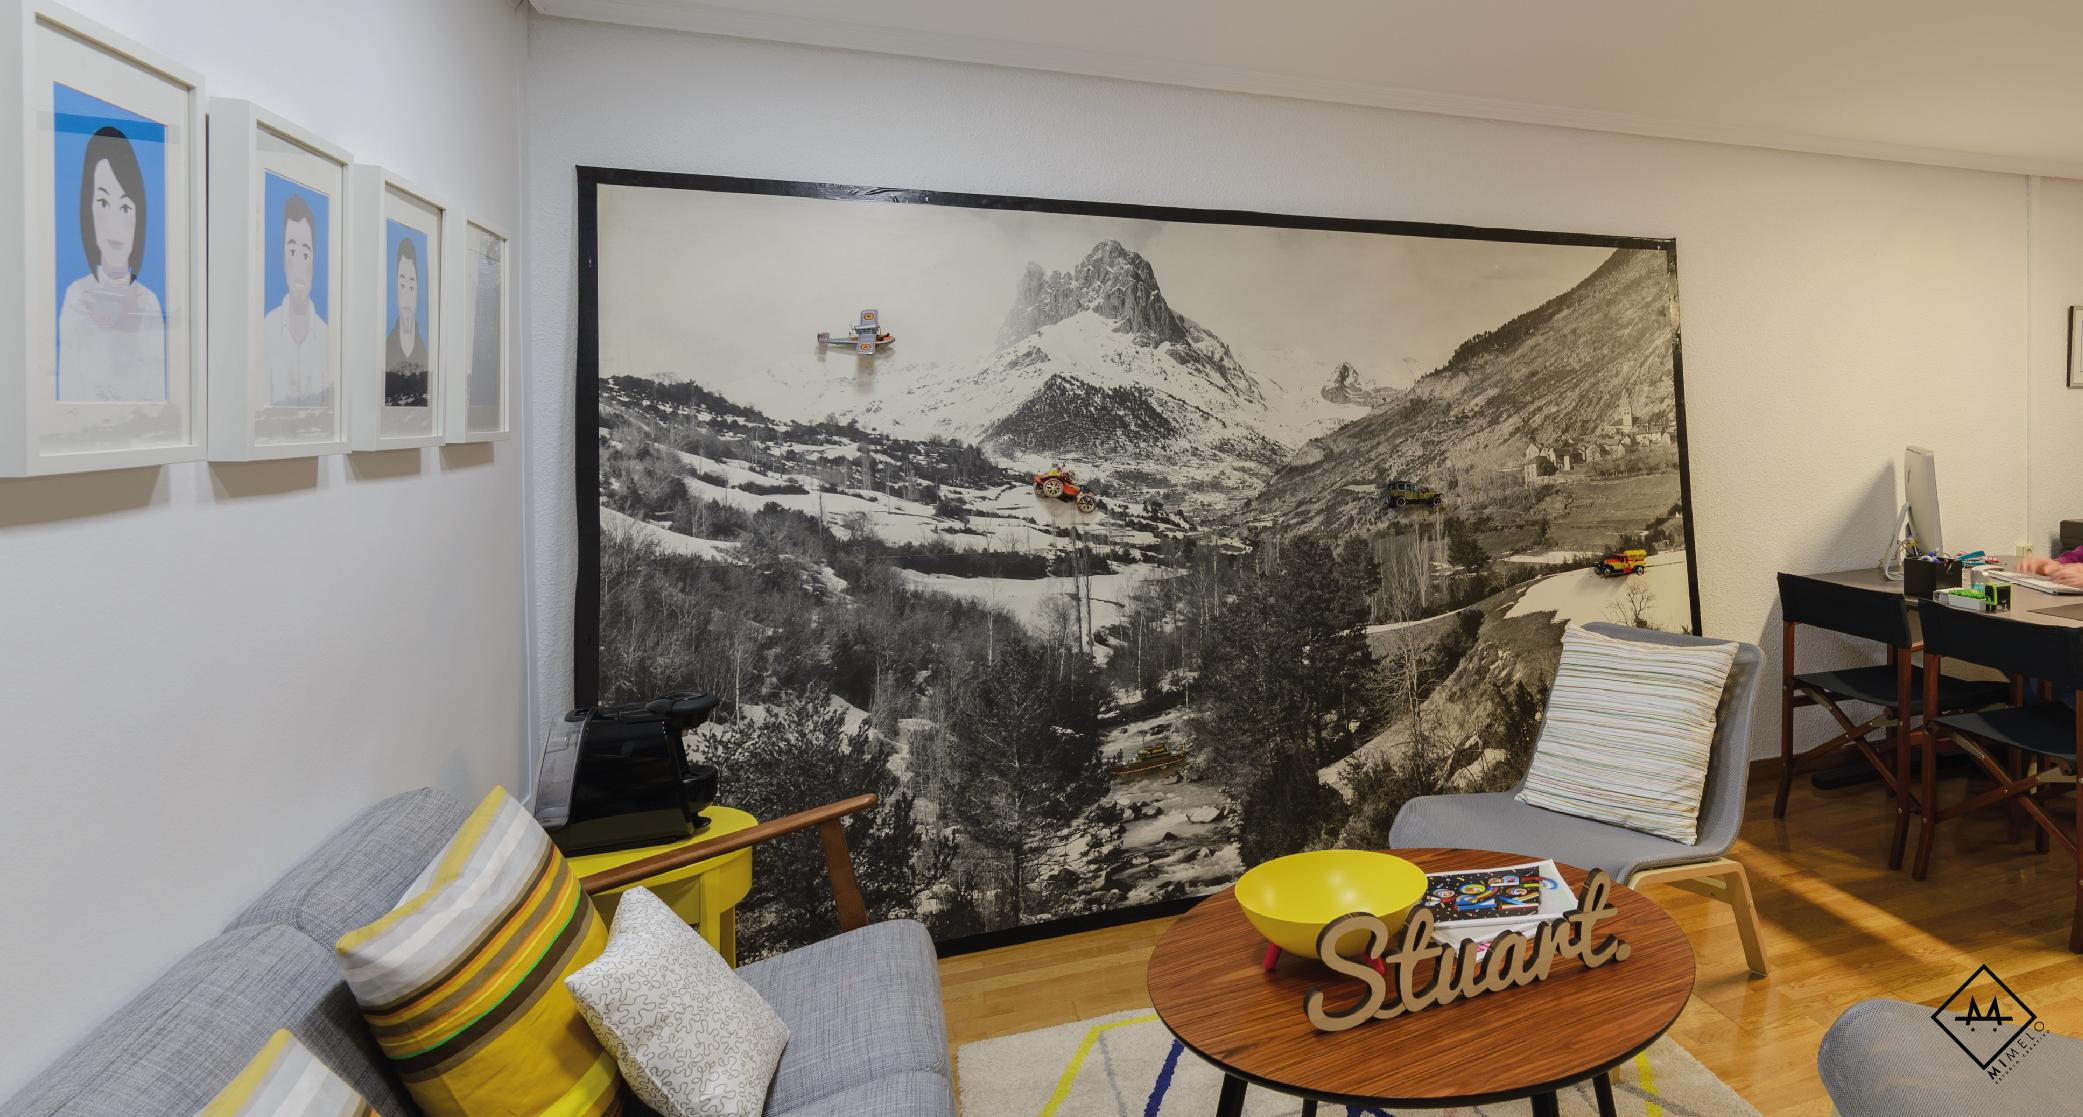 Stuart Studio - Mimelo Estudio Creativo